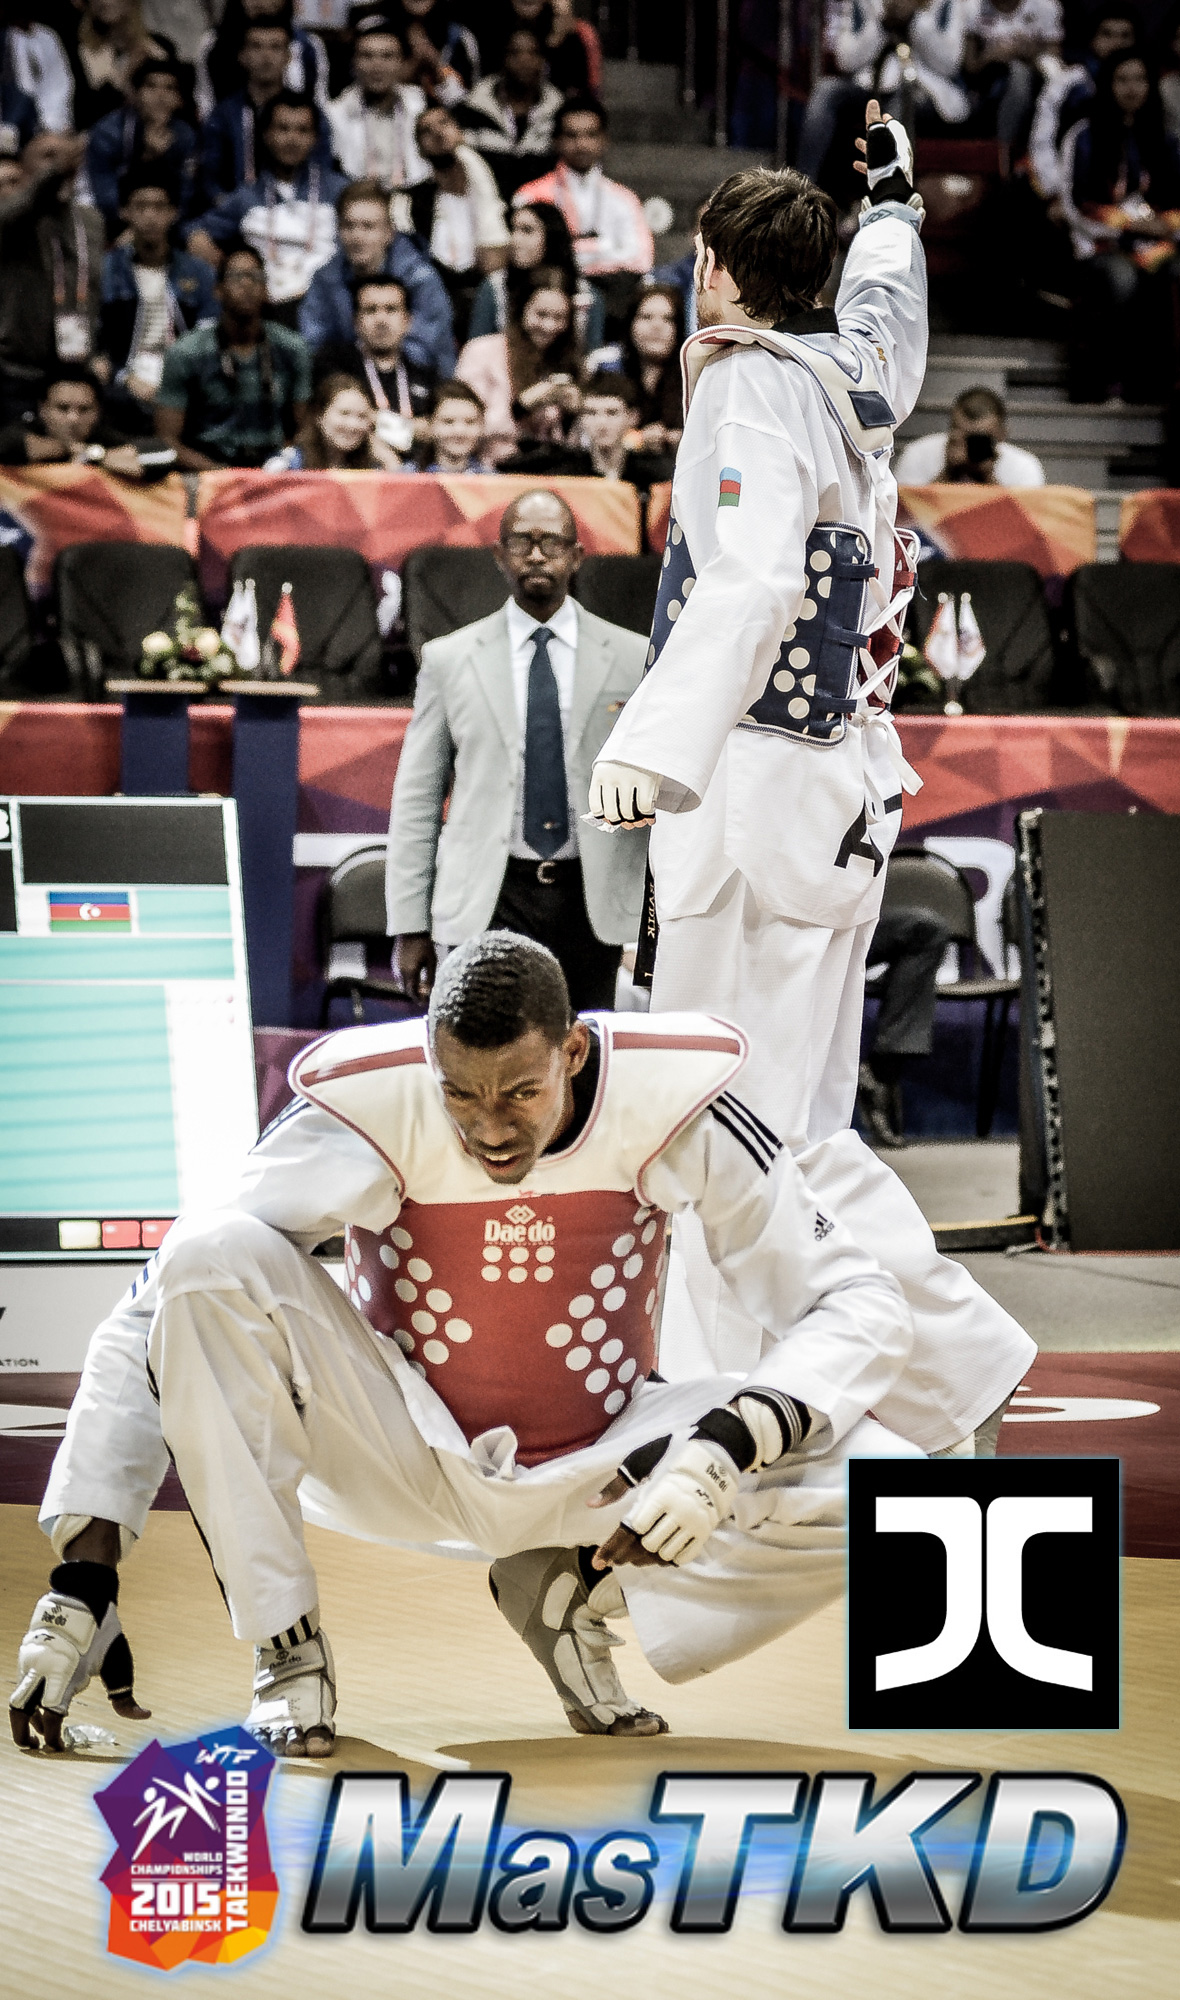 2_Mundial-Taekwondo_JCalicu-Seleccion-Mejor-Foto_